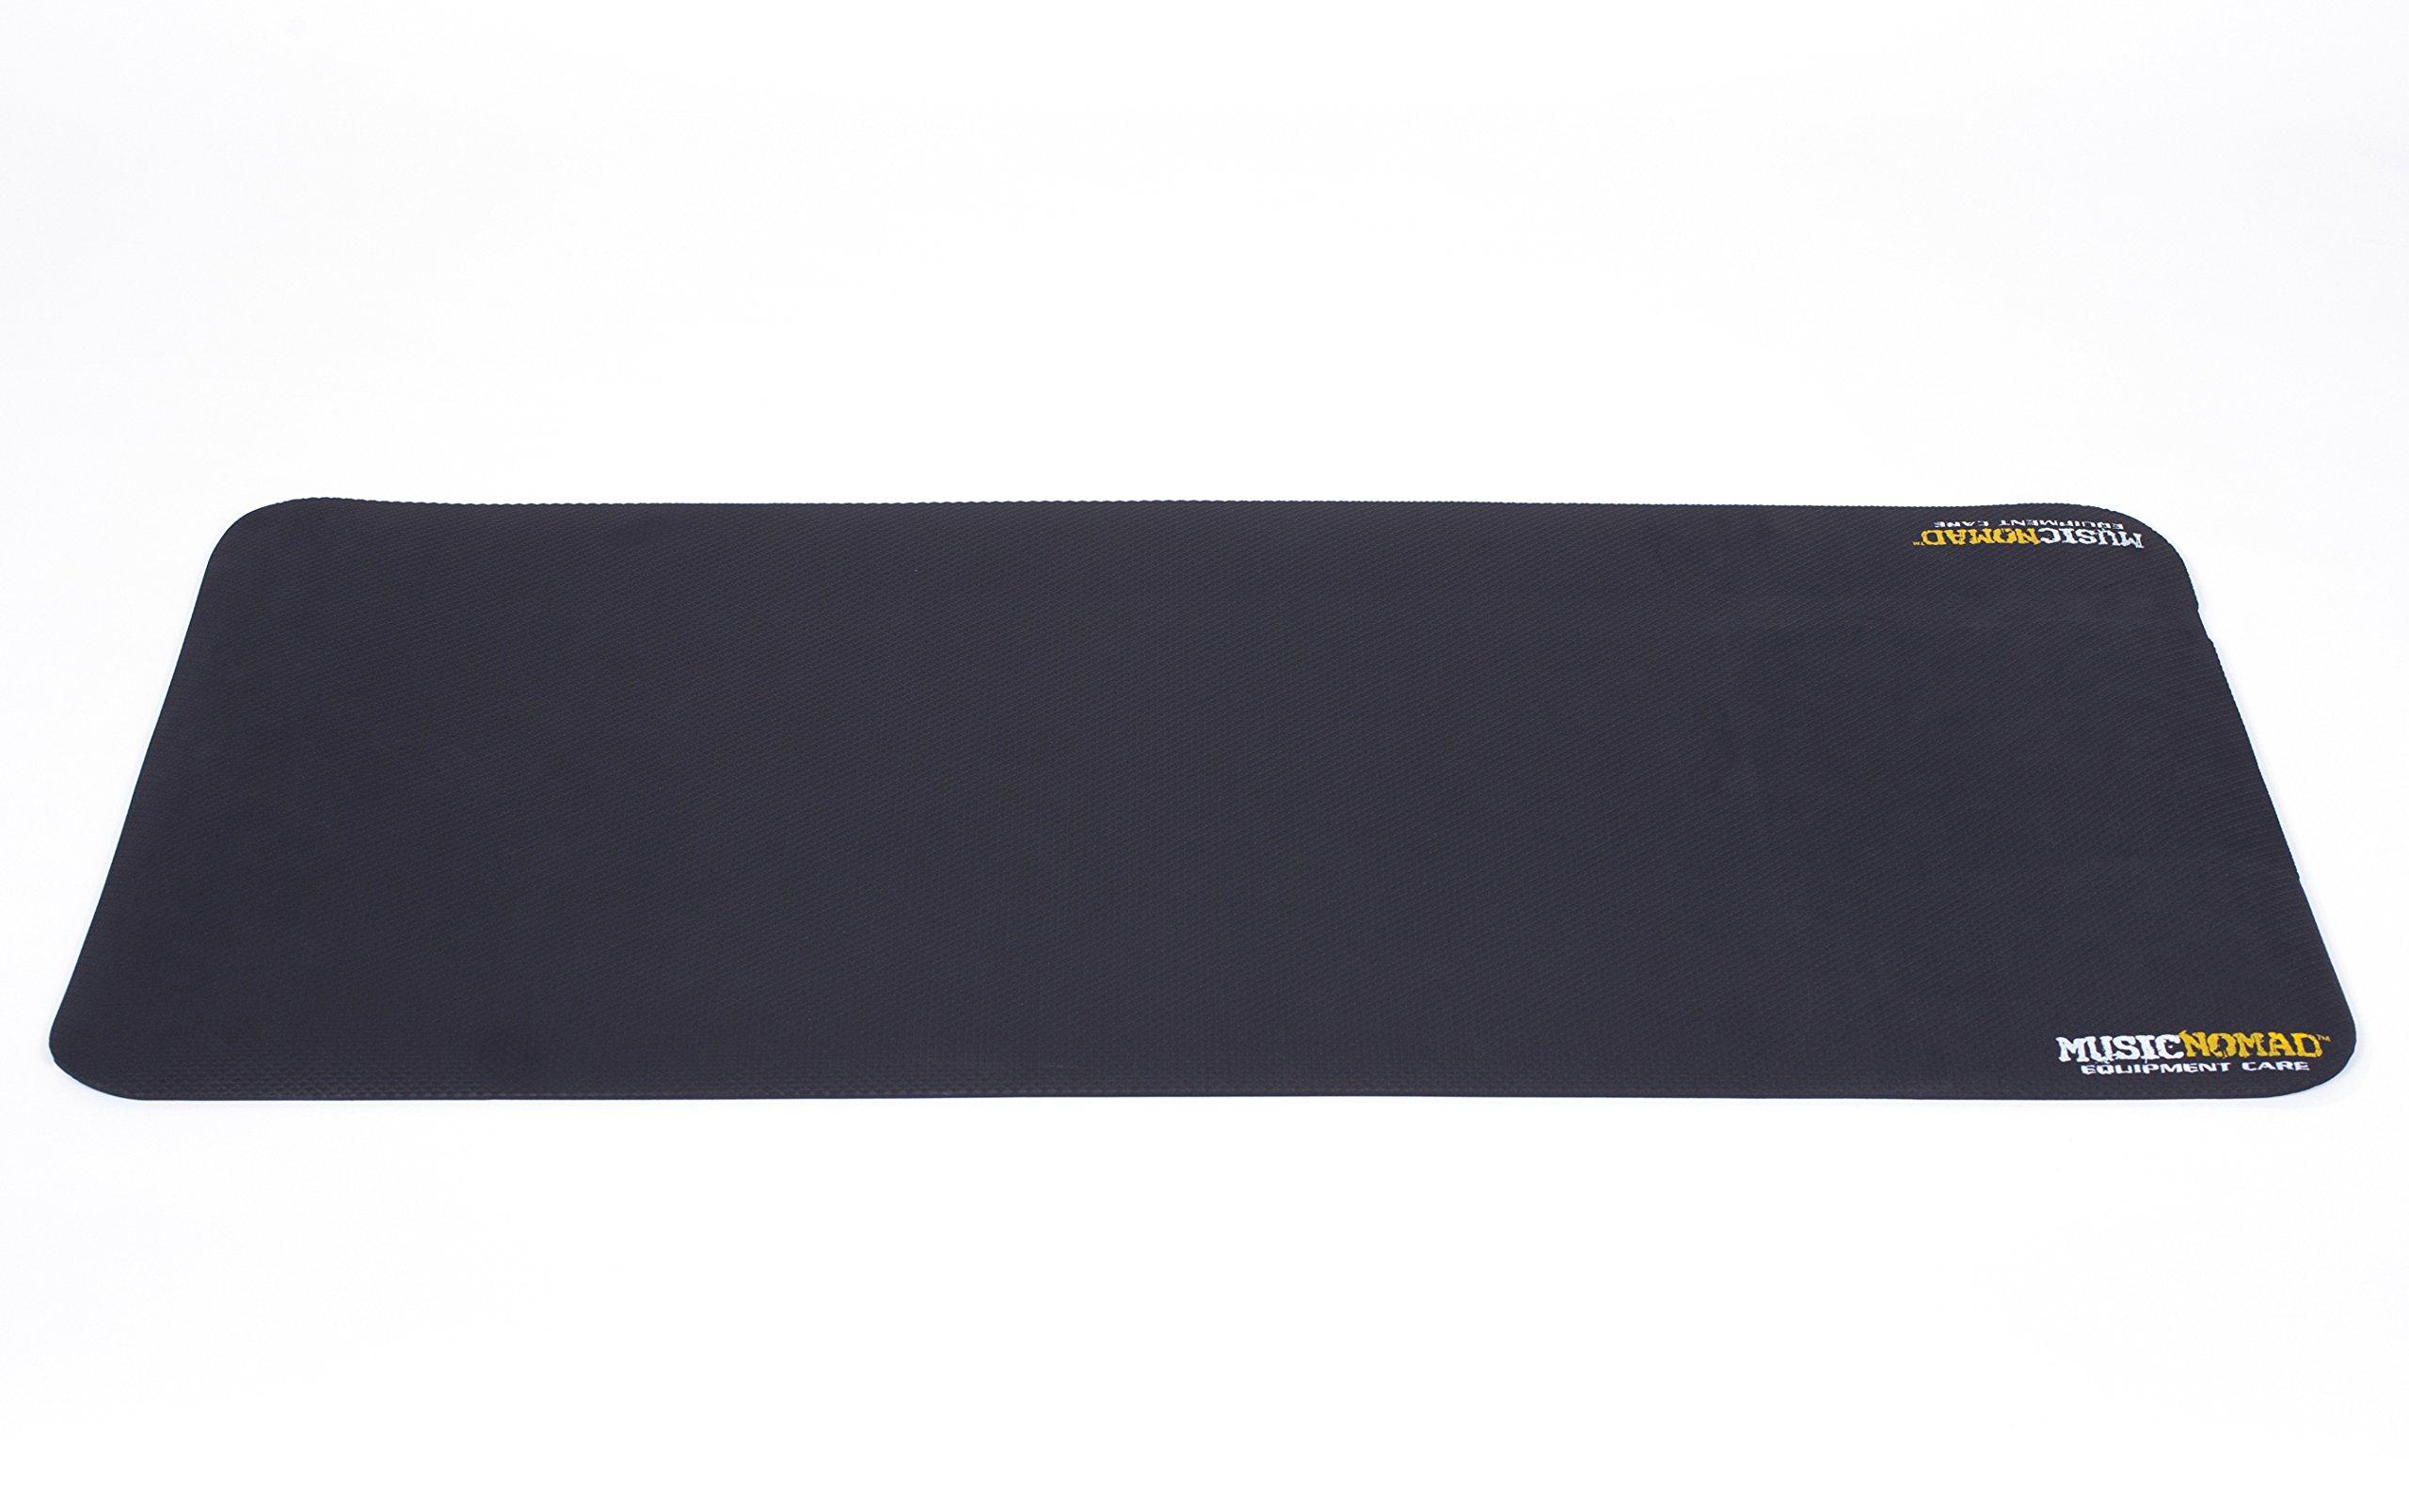 Music Nomad MN208 Premium Instrument Work Mat, 17'' x 36''